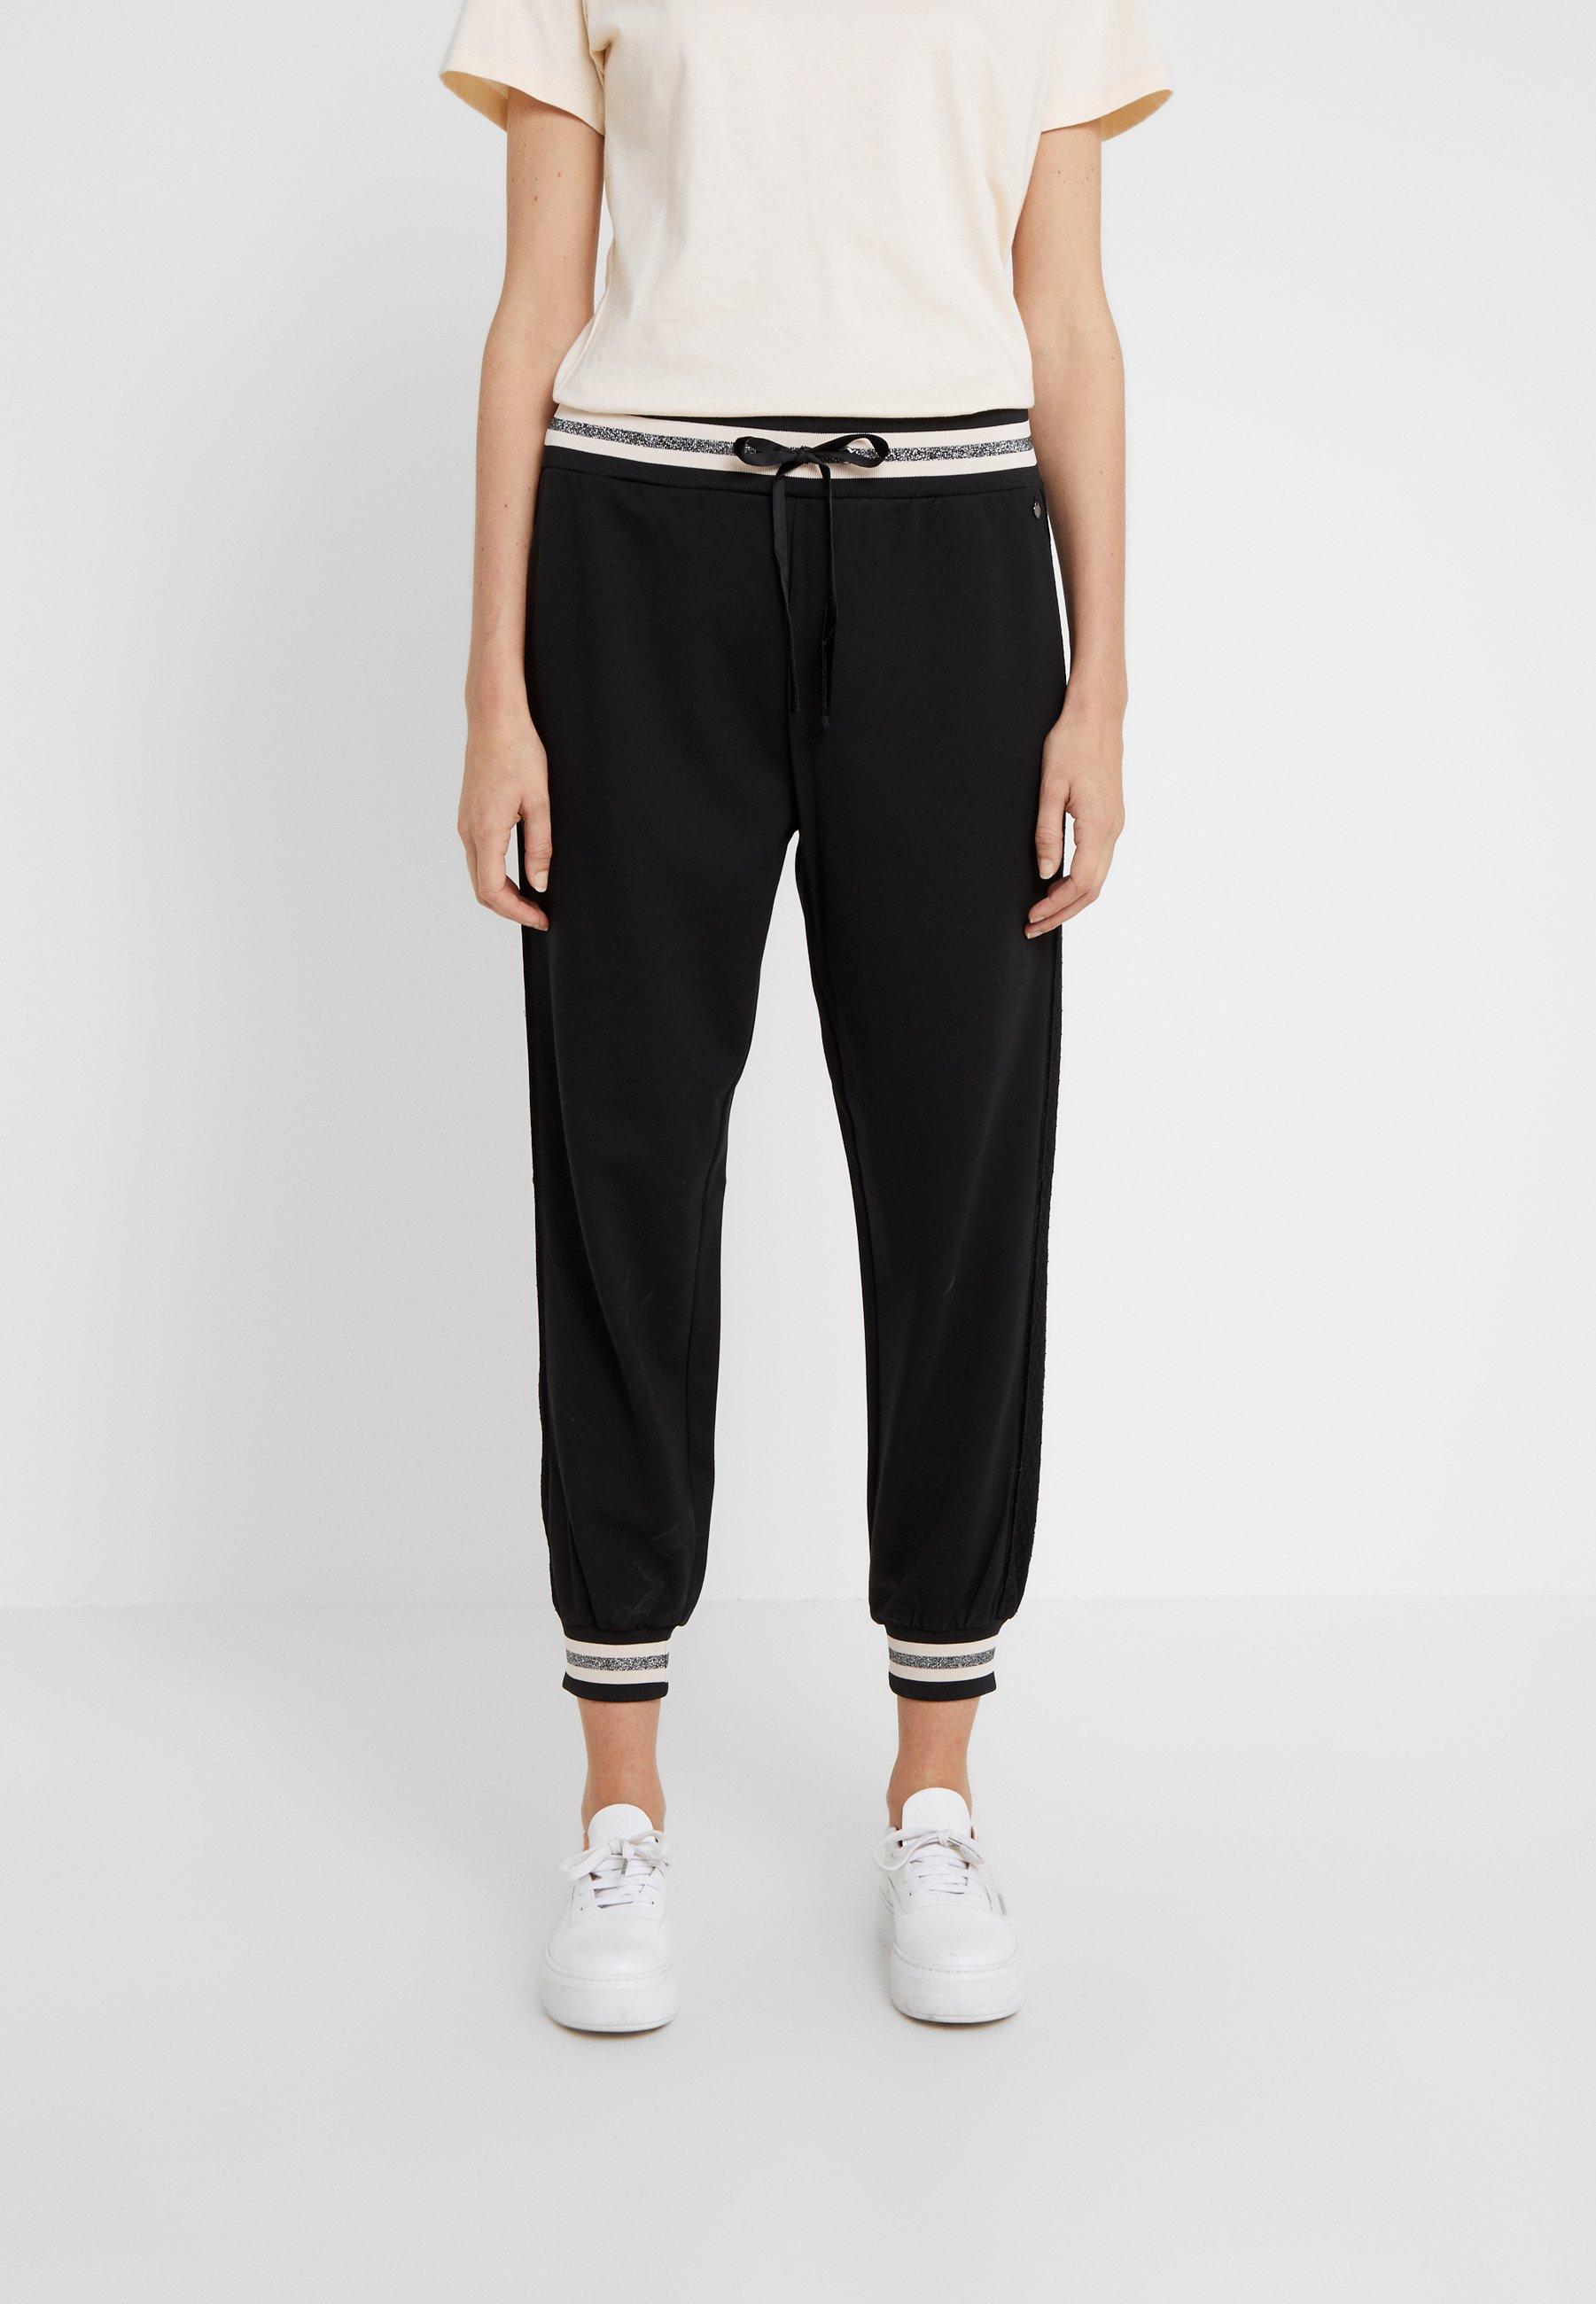 TWINSET IN PUNTO MILANO - Pantaloni sportivi nero